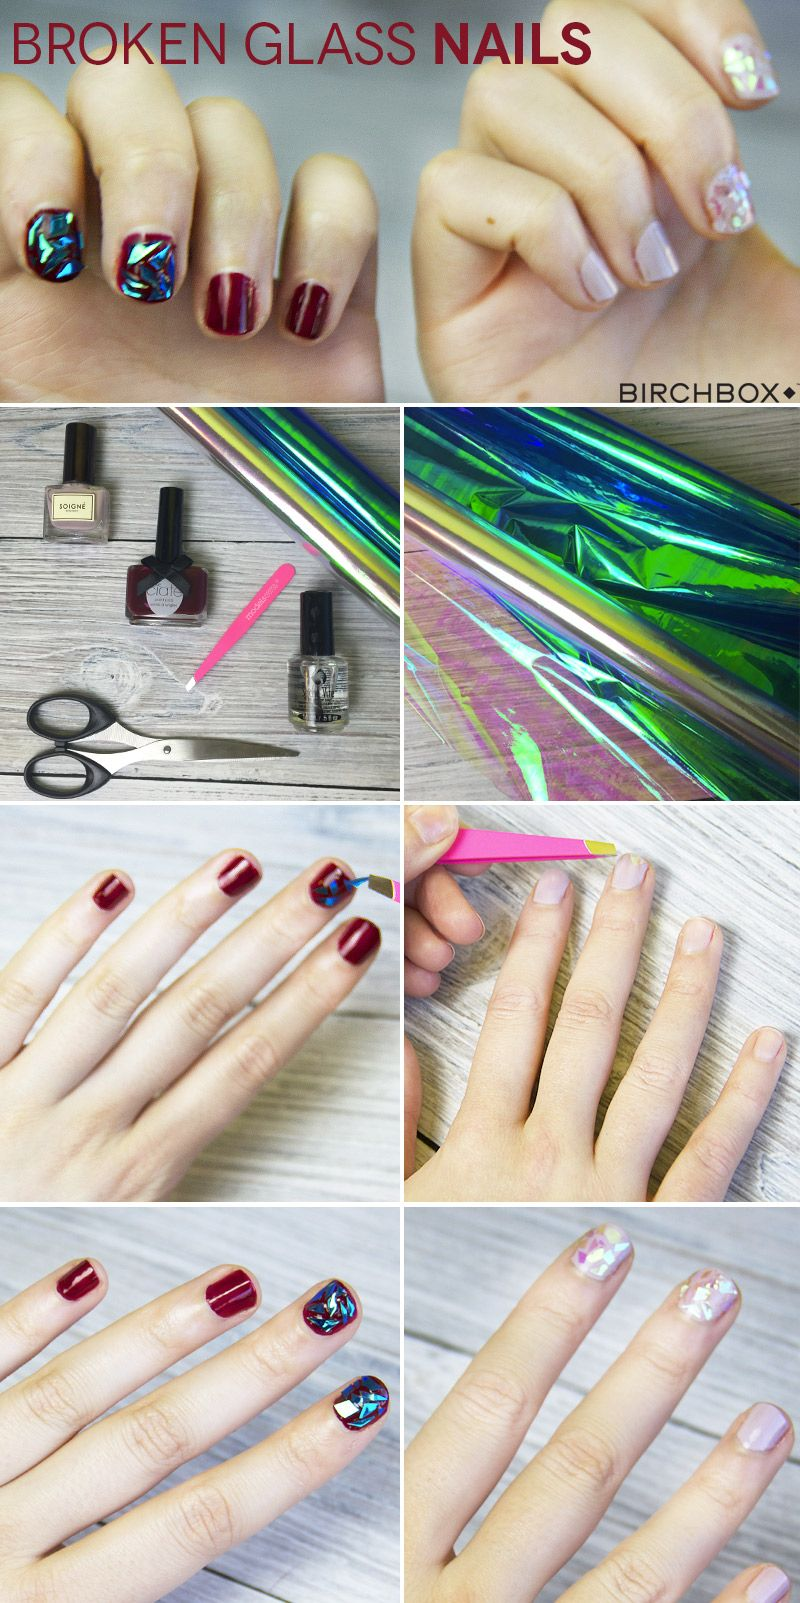 How to broken glass nails tutorial broken glass beauty trends broken glass nails are the soko beauty trend weve been desperate to try solutioingenieria Gallery